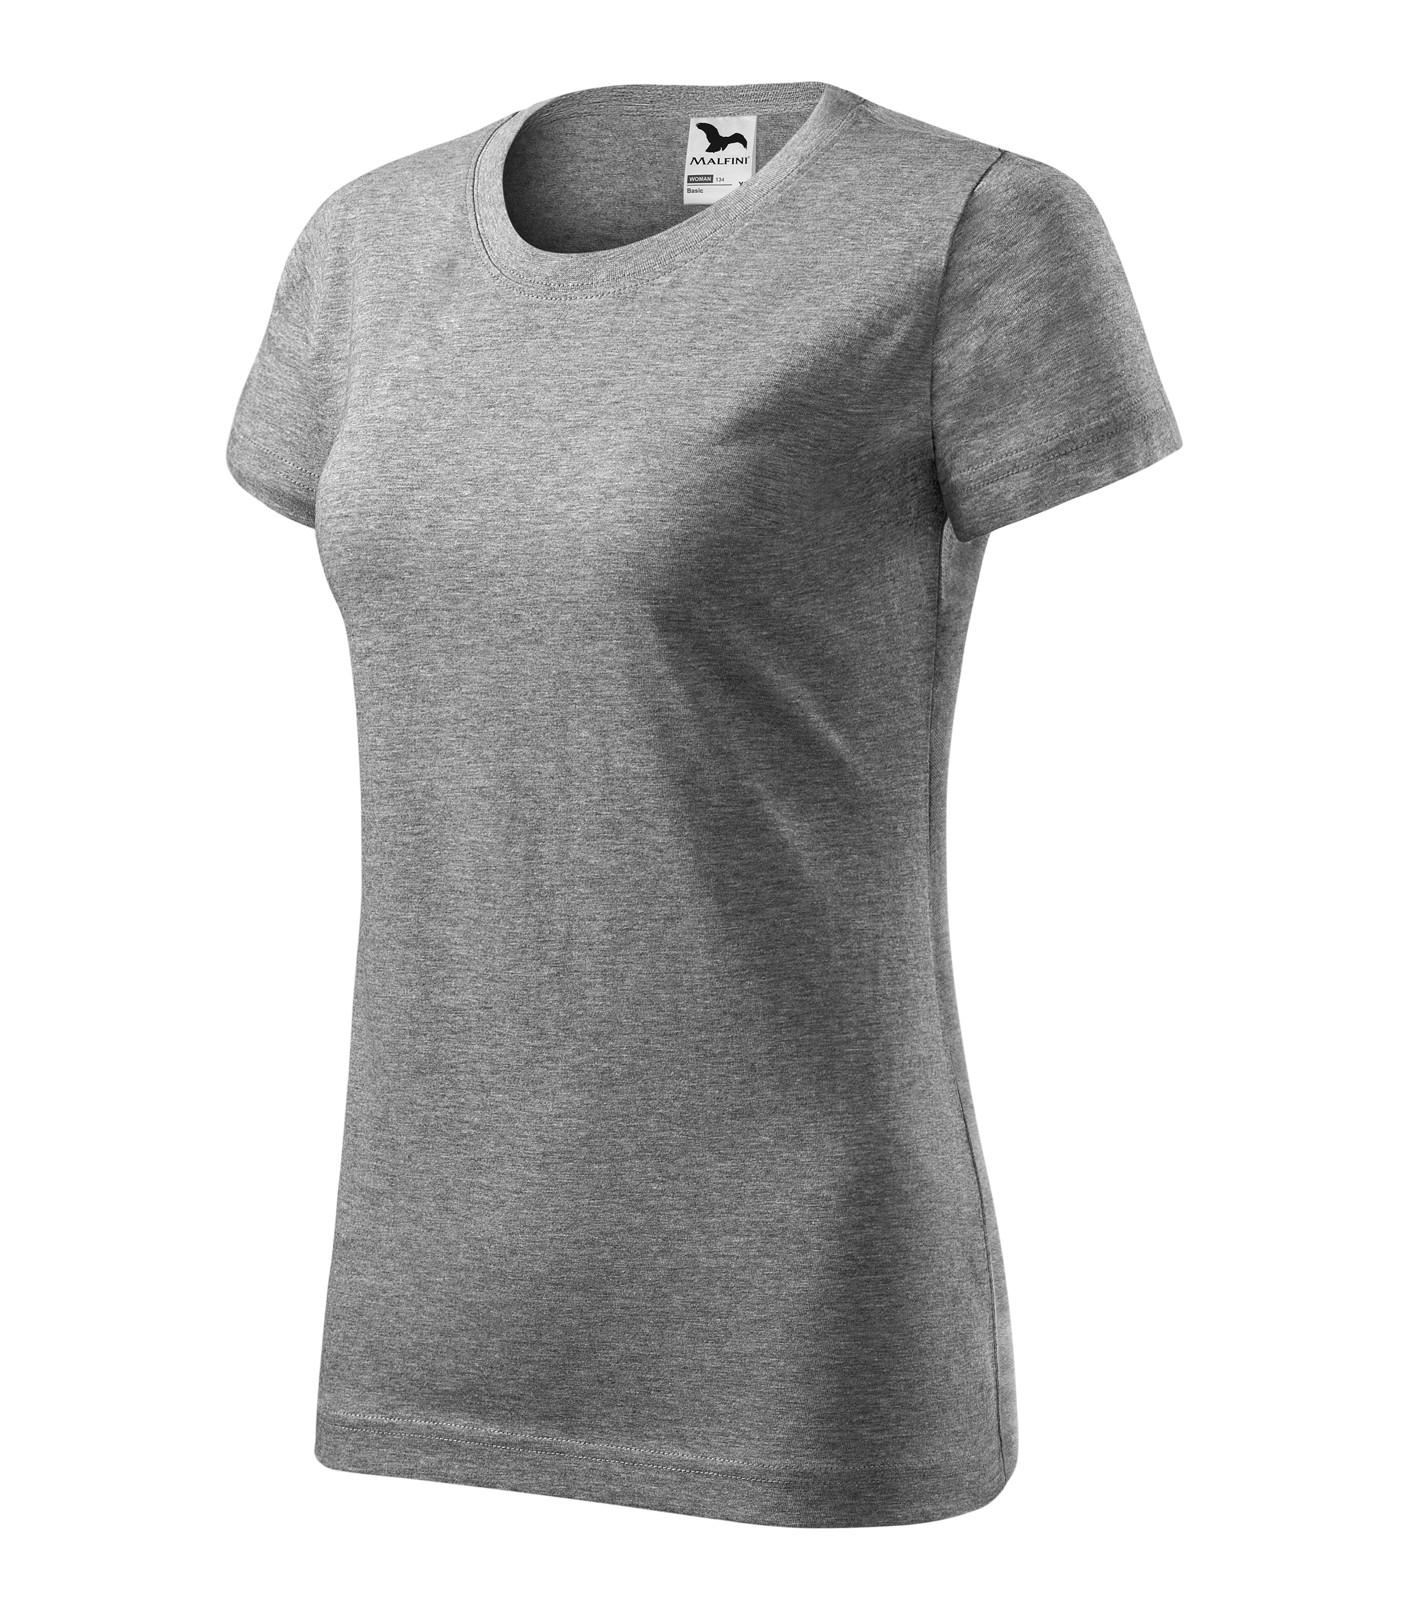 T-shirt women's Malfini Basic - Dark Gray Melange / M